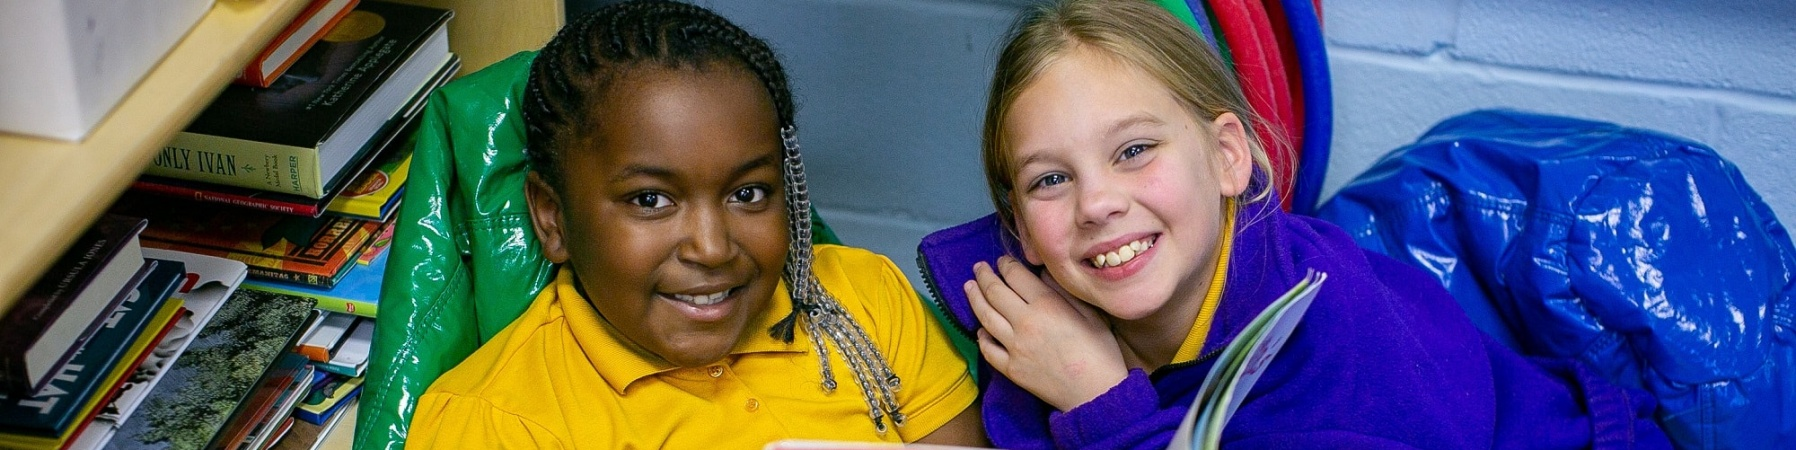 due bambine sedute su puff colorati leggono insieme